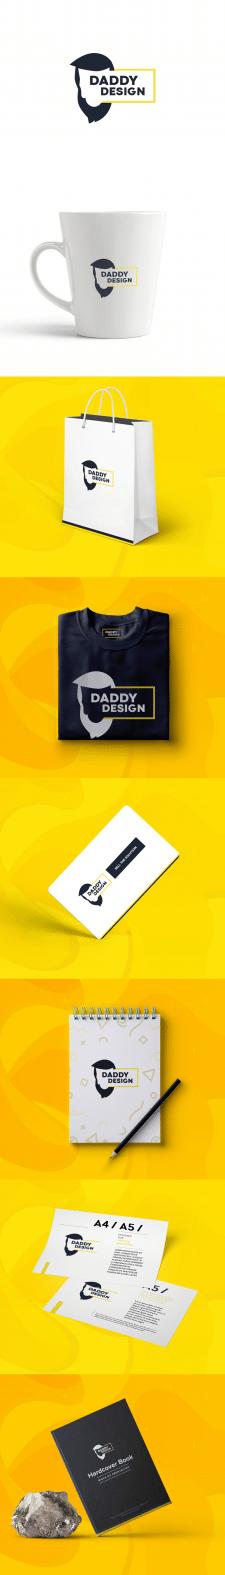 Логотип для DaddyDesign